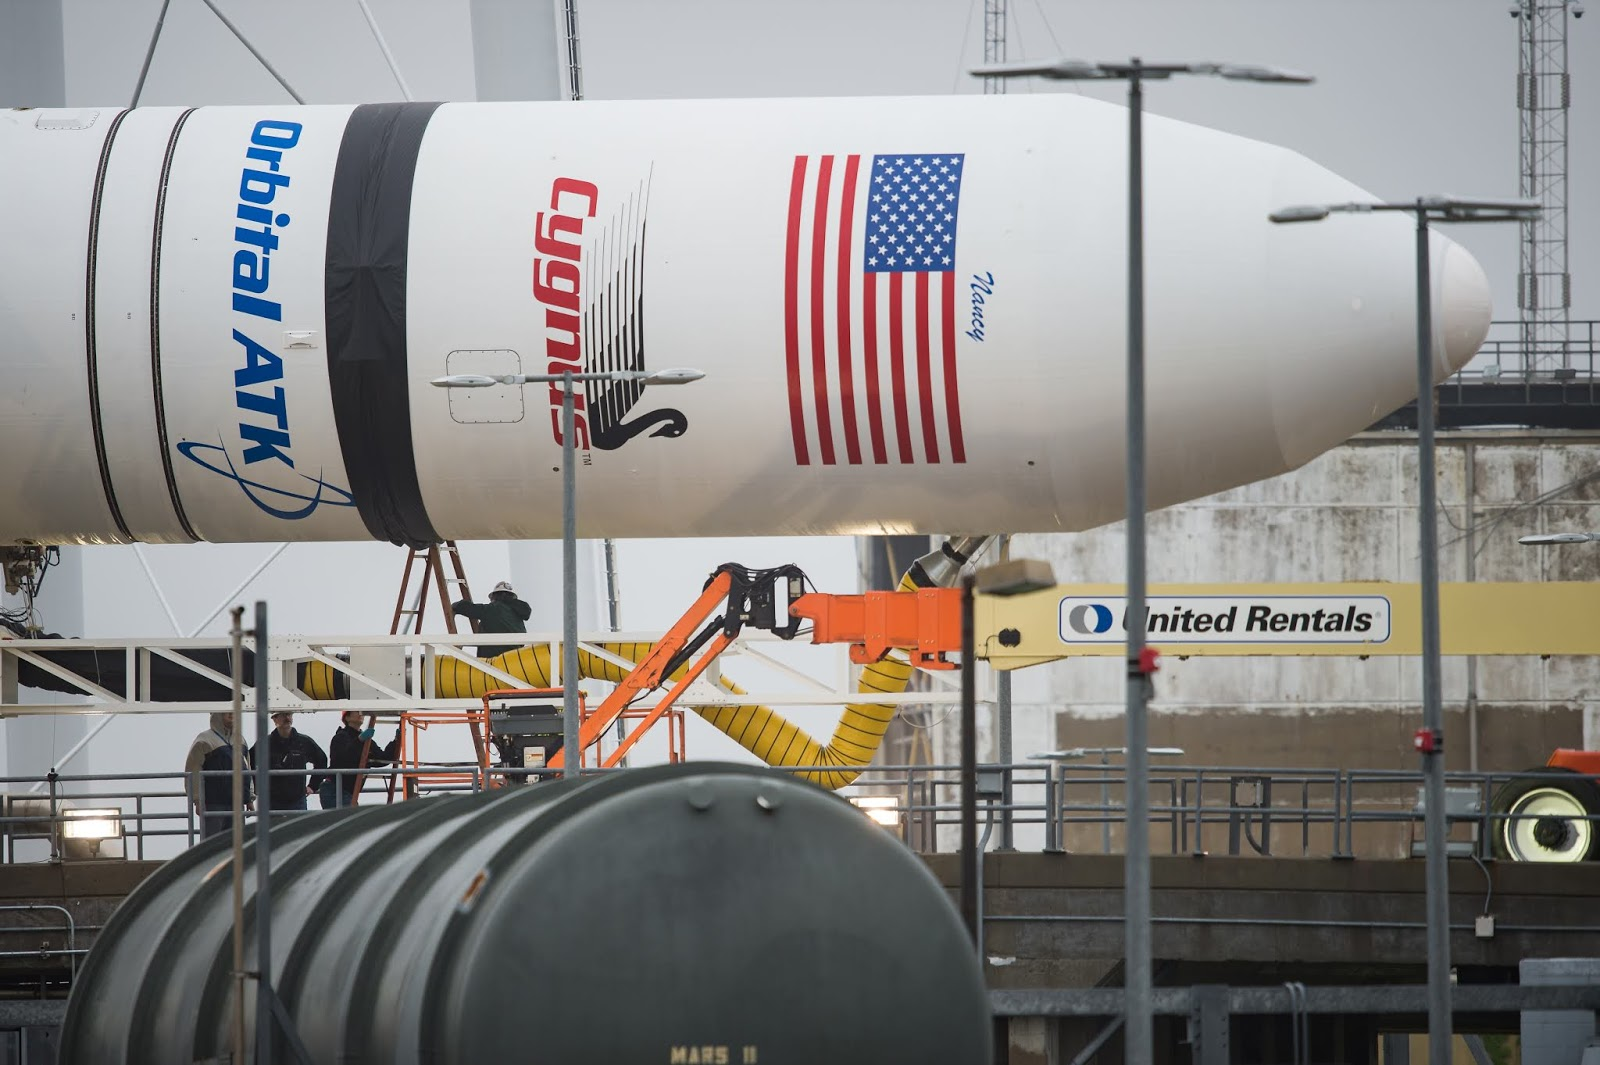 Image above Antares rocket arrival at Pad